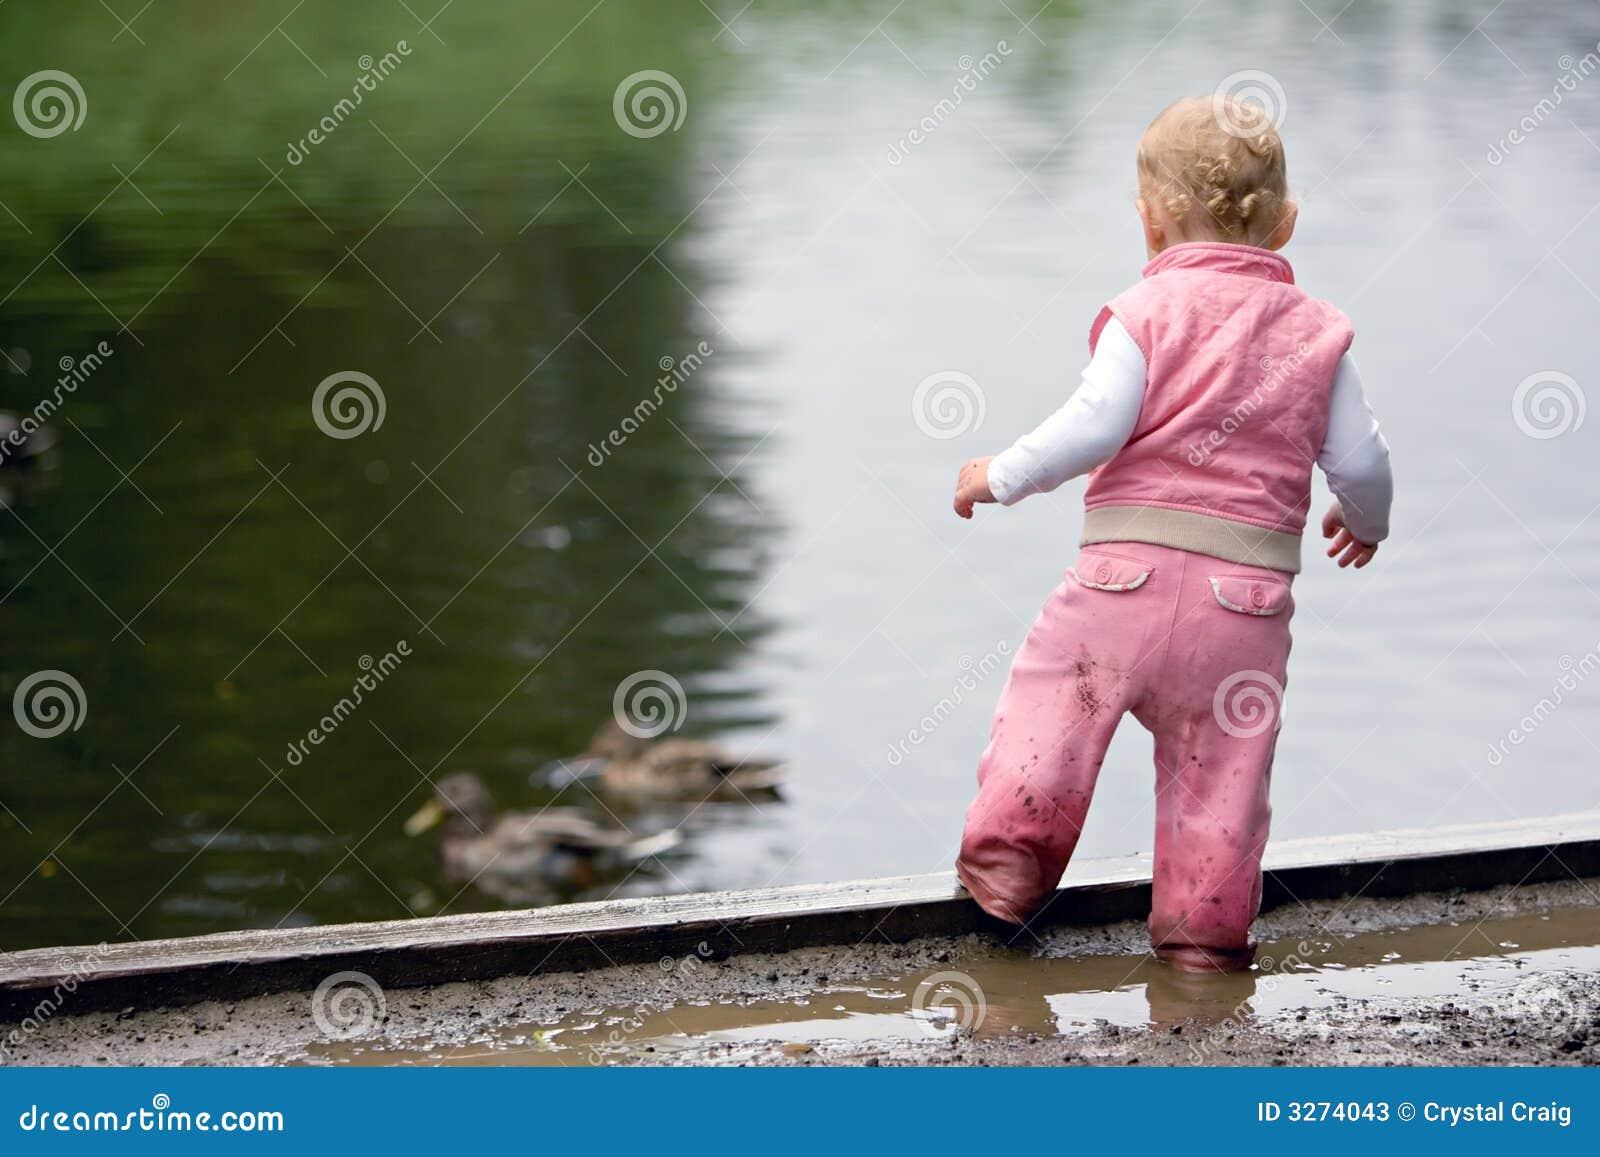 Toddler beside duck pond